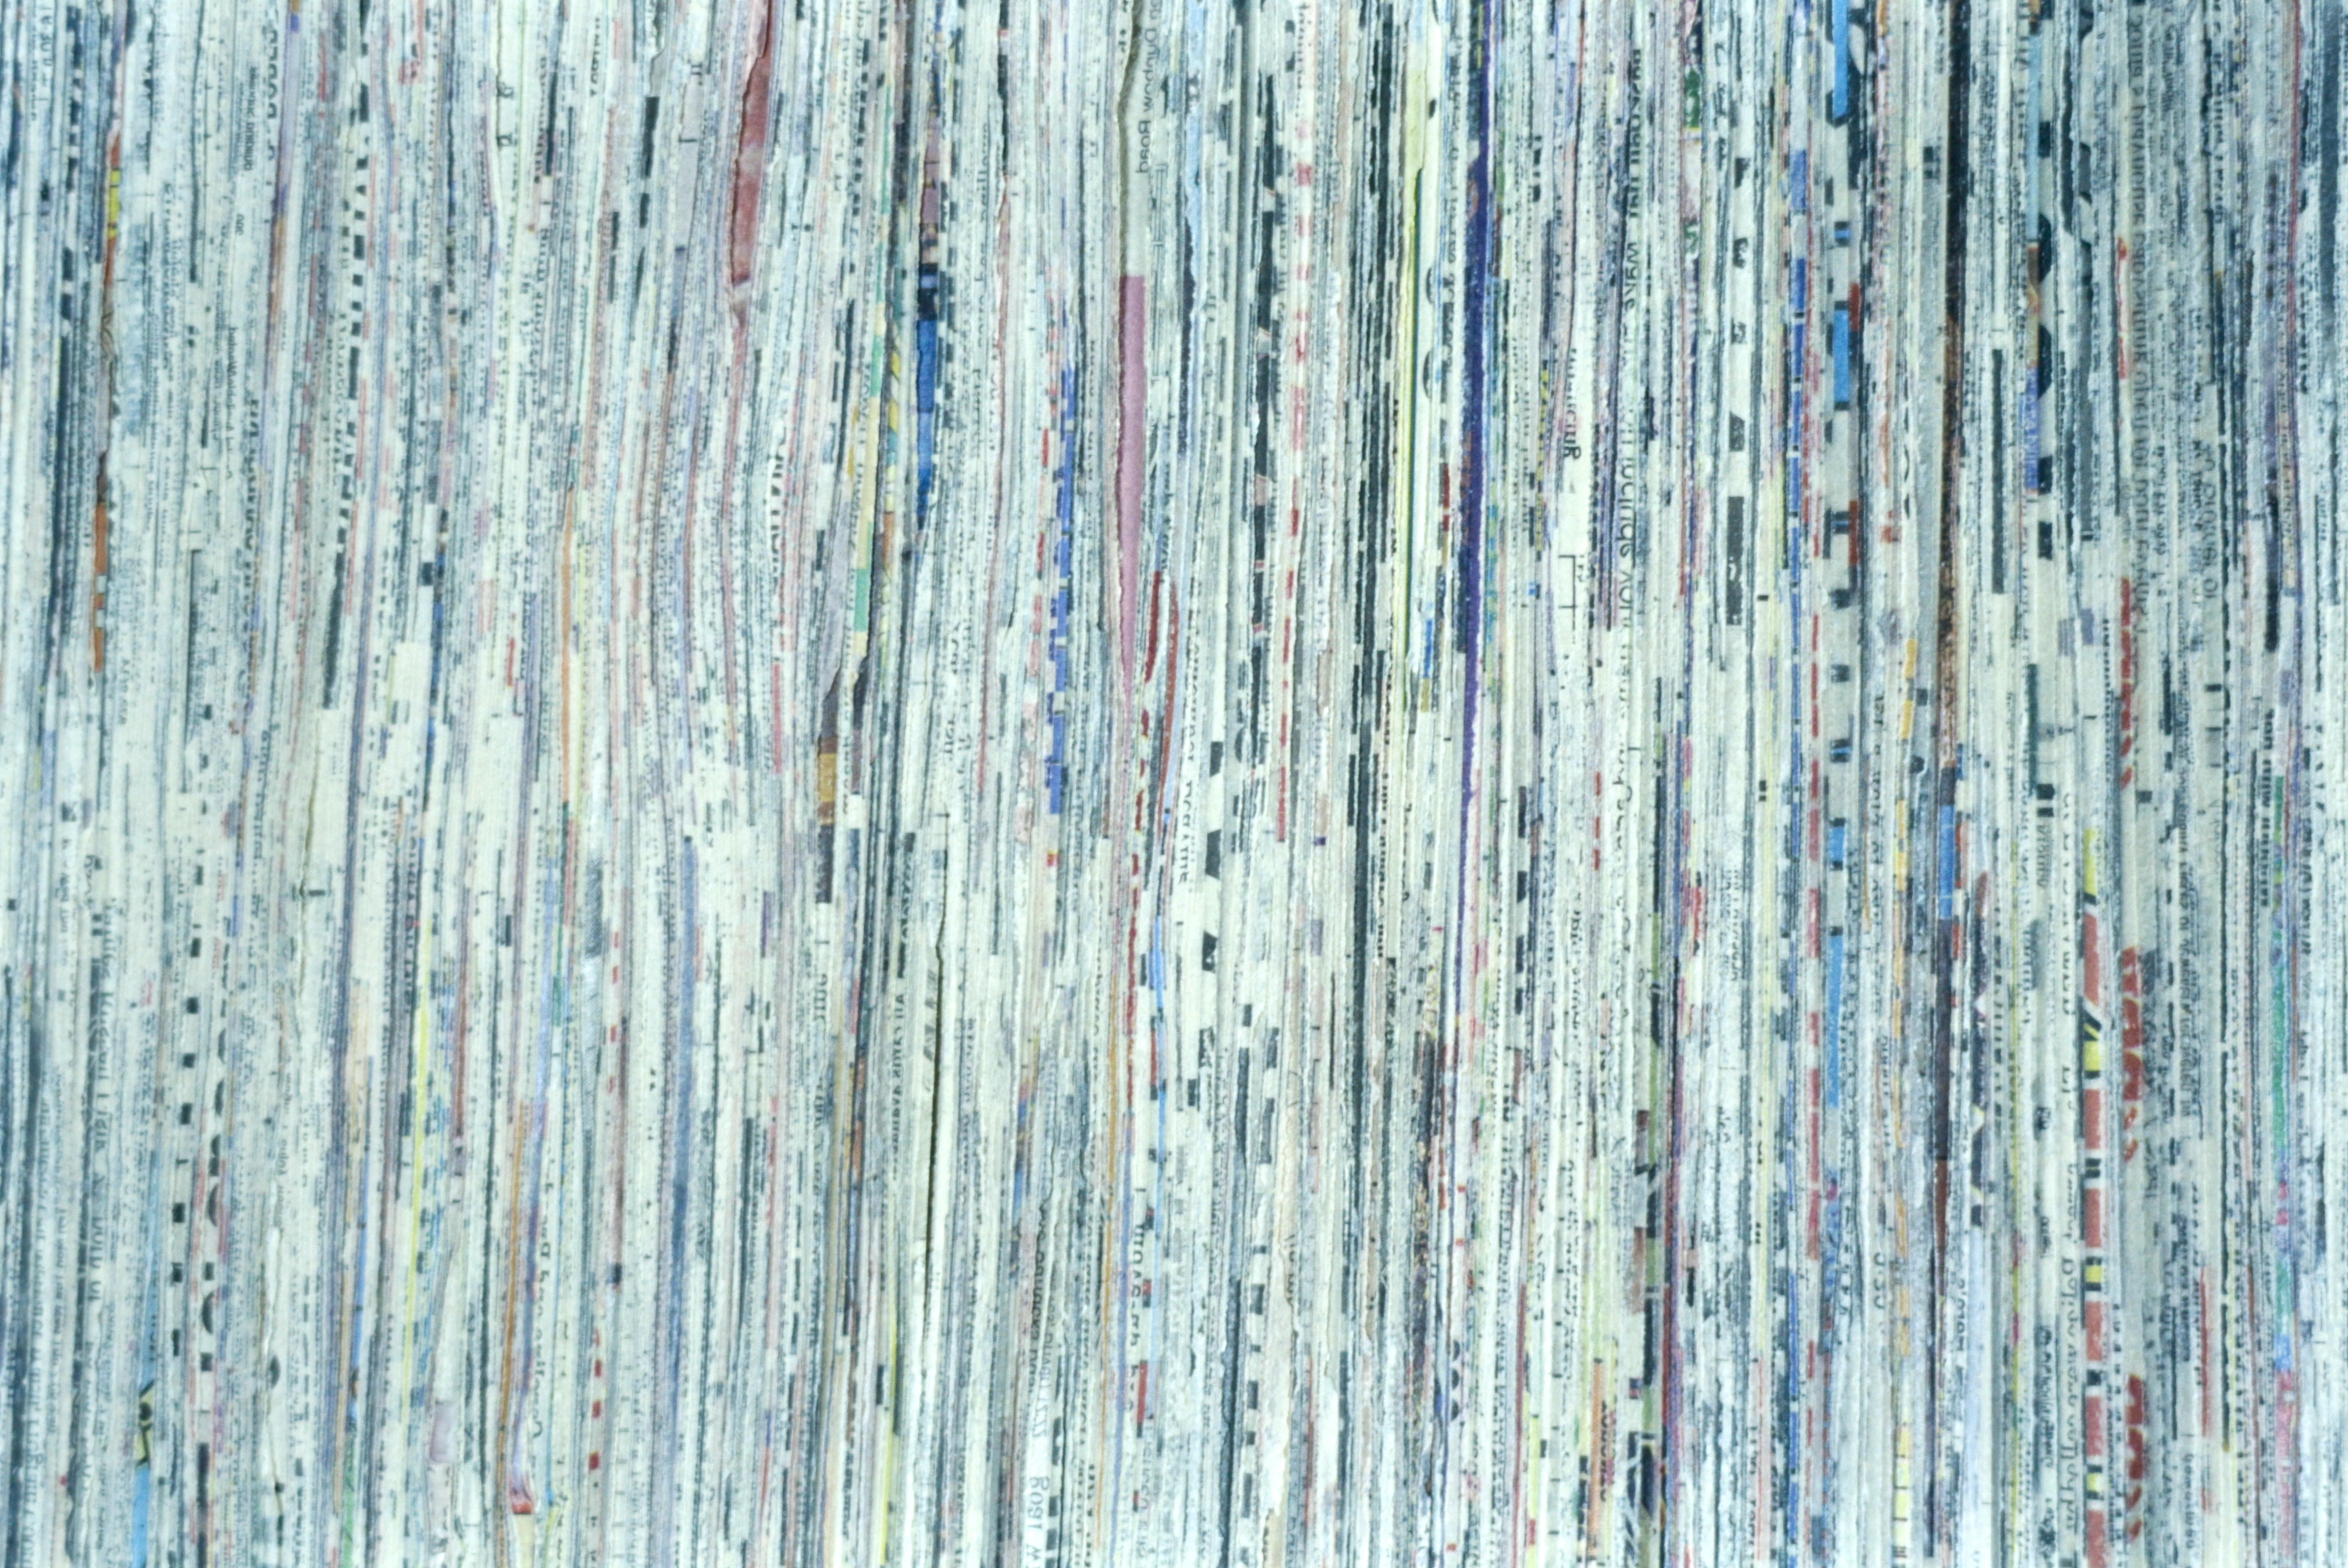 "the sun:  The Calgary Sun on birch (1996) 2' x 2' x 2"", collection Alberta Foundation for the Arts"